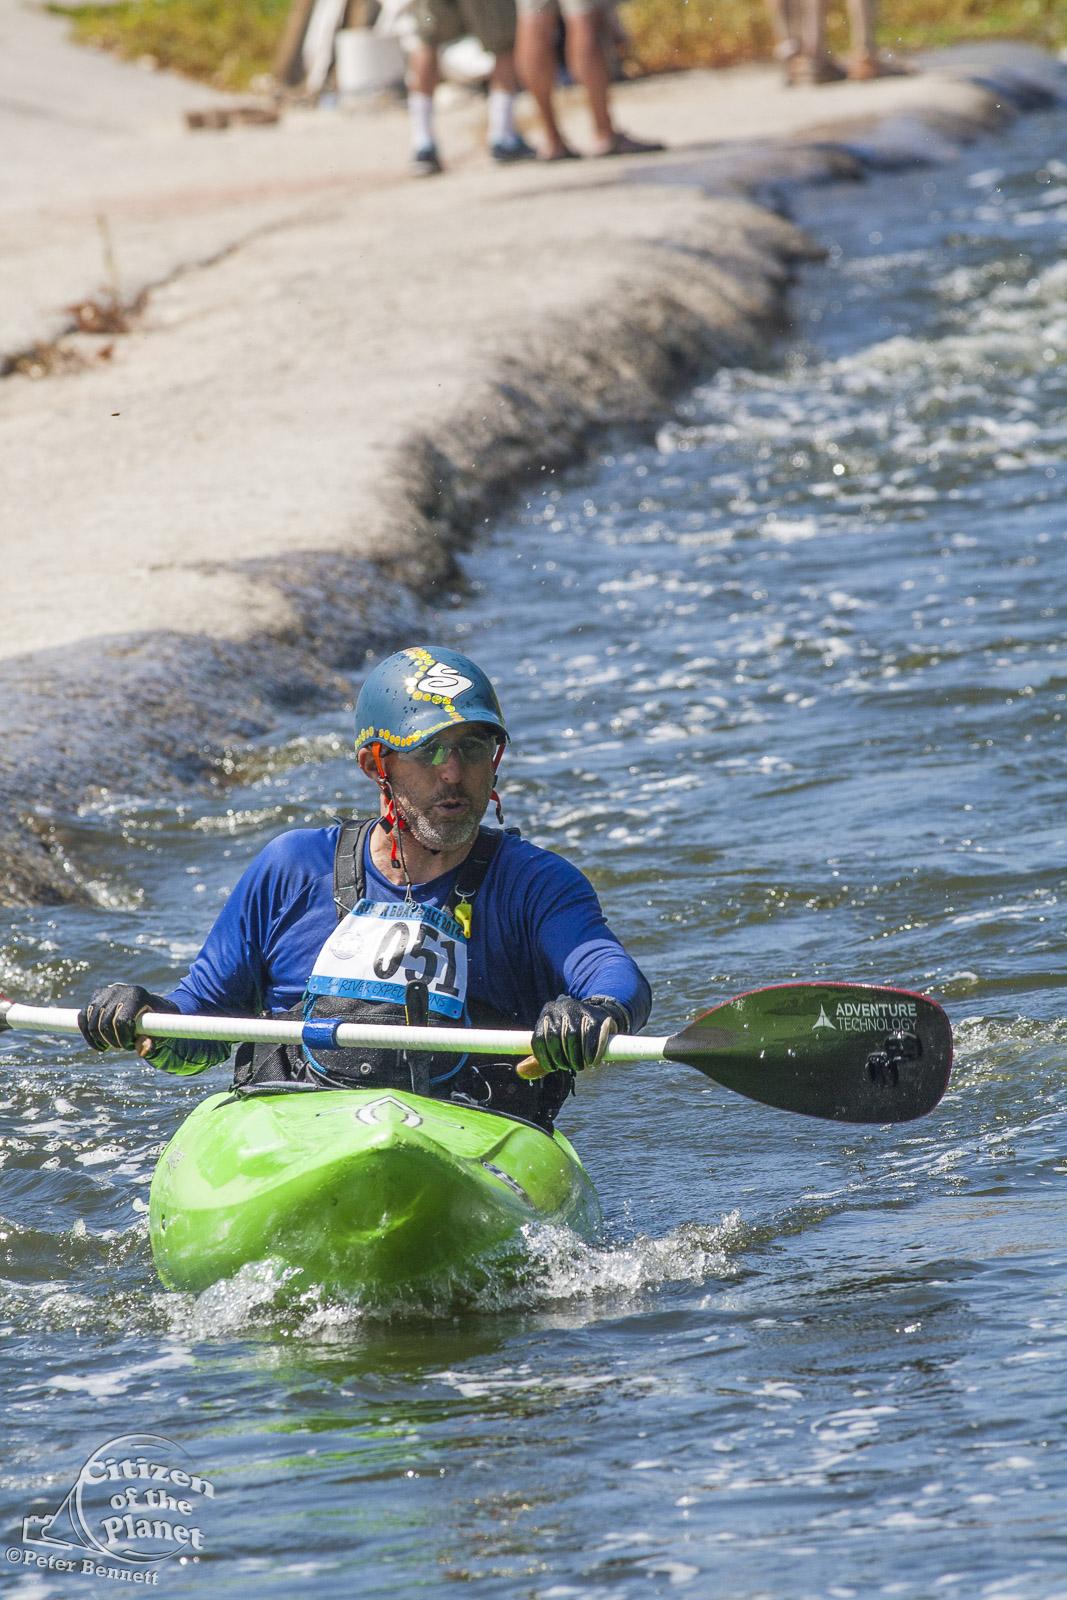 US_CA_48_3843_la_river_boat_race.jpg